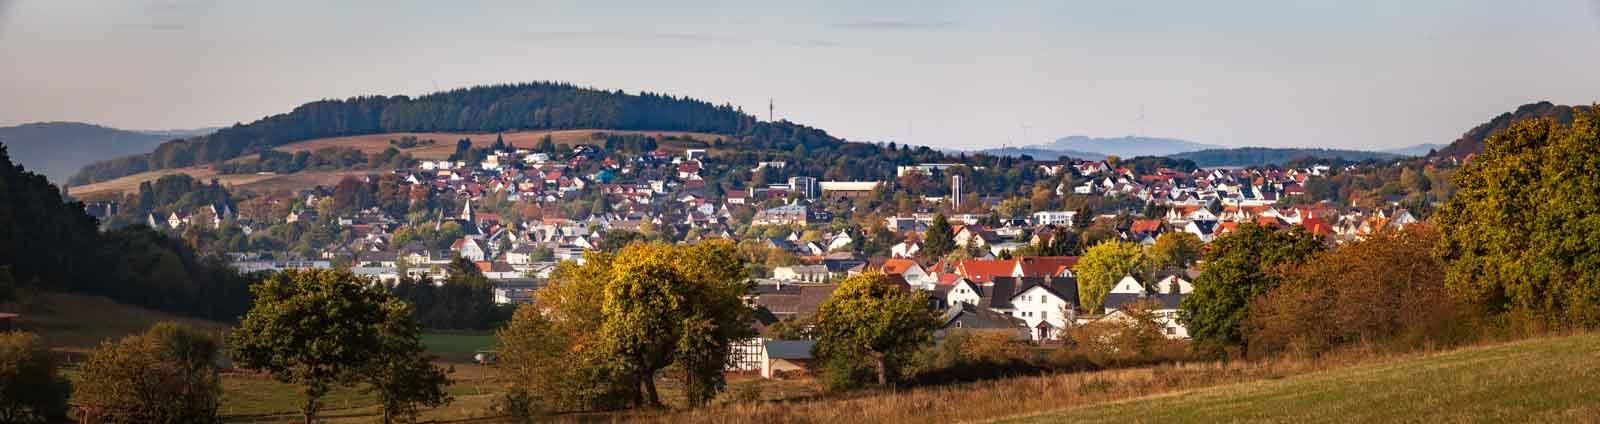 Deutschland, Europa, Europe, Germany, Gladenbach, Herbst, Hessen, Hessia, Location, Mittelhessen, Ort, autumn, fall